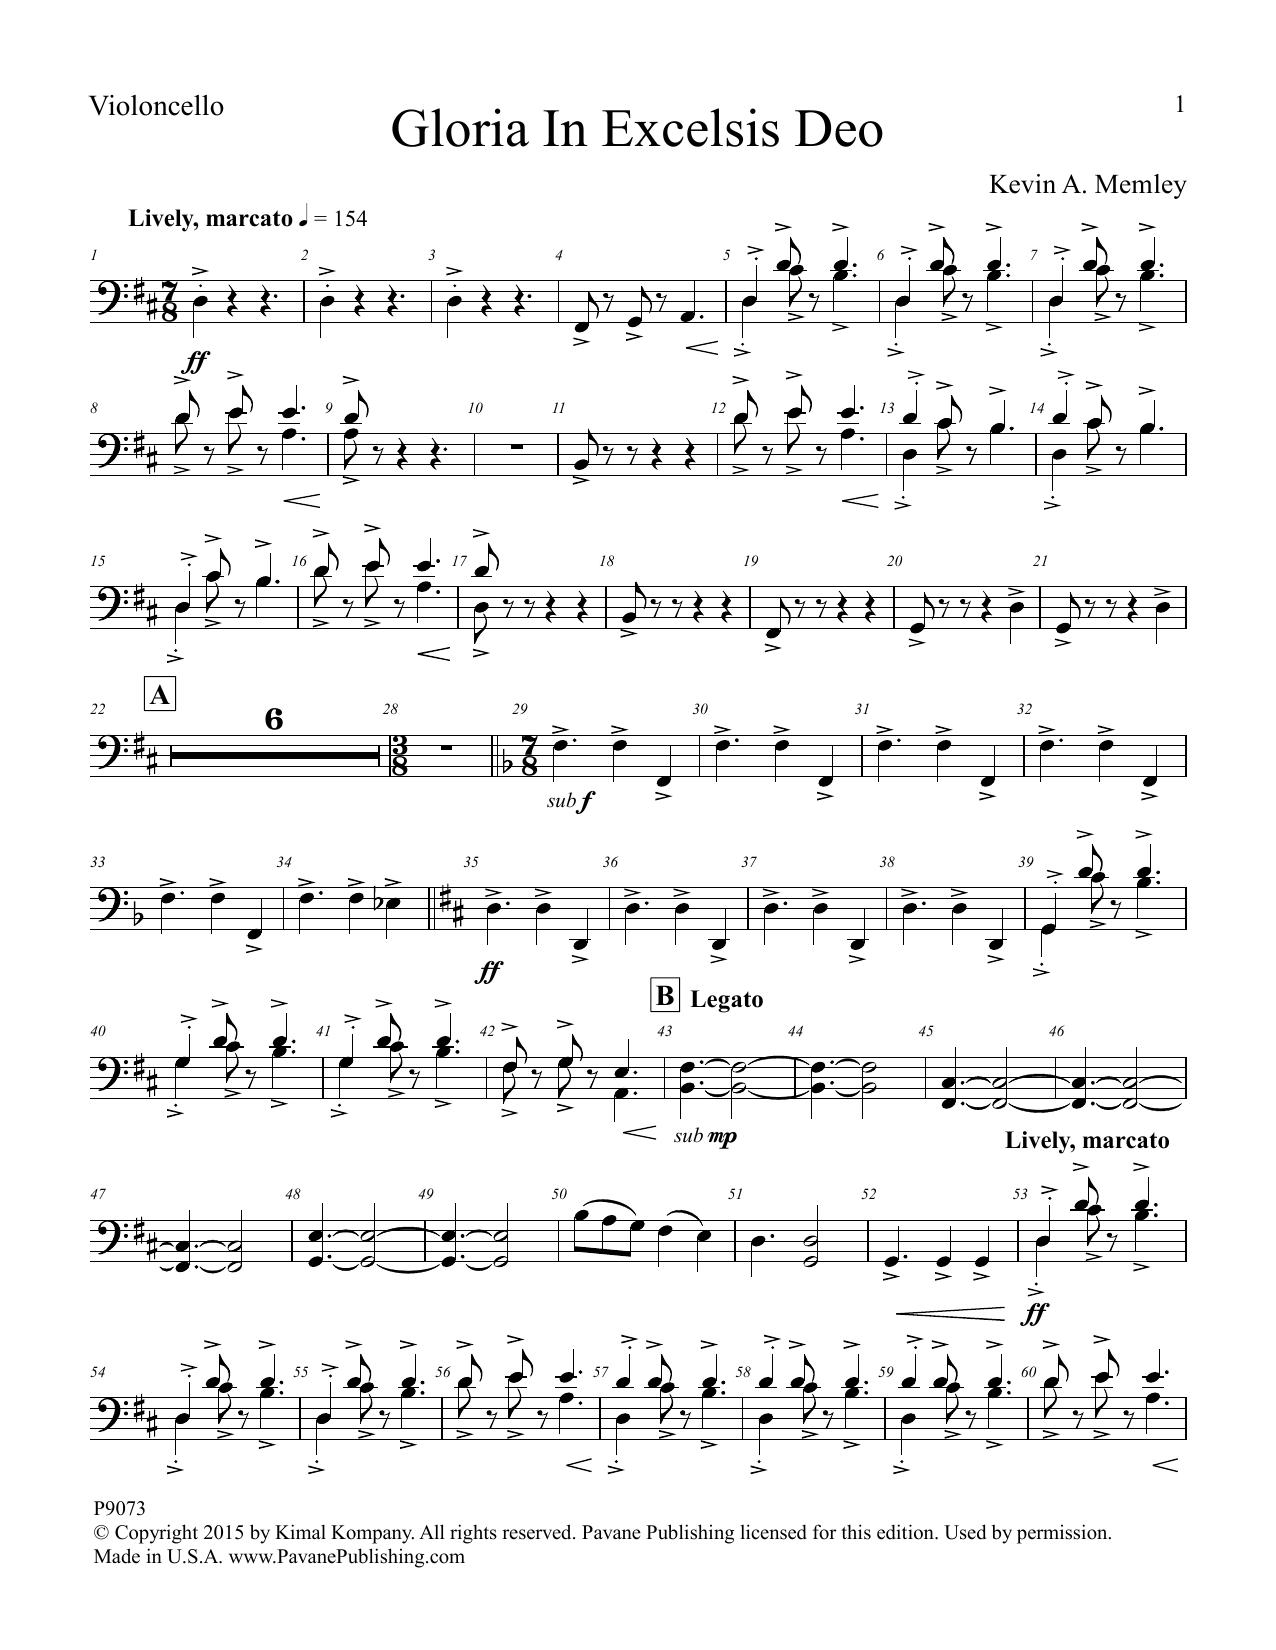 Gloria in Excelsis Deo - Viola